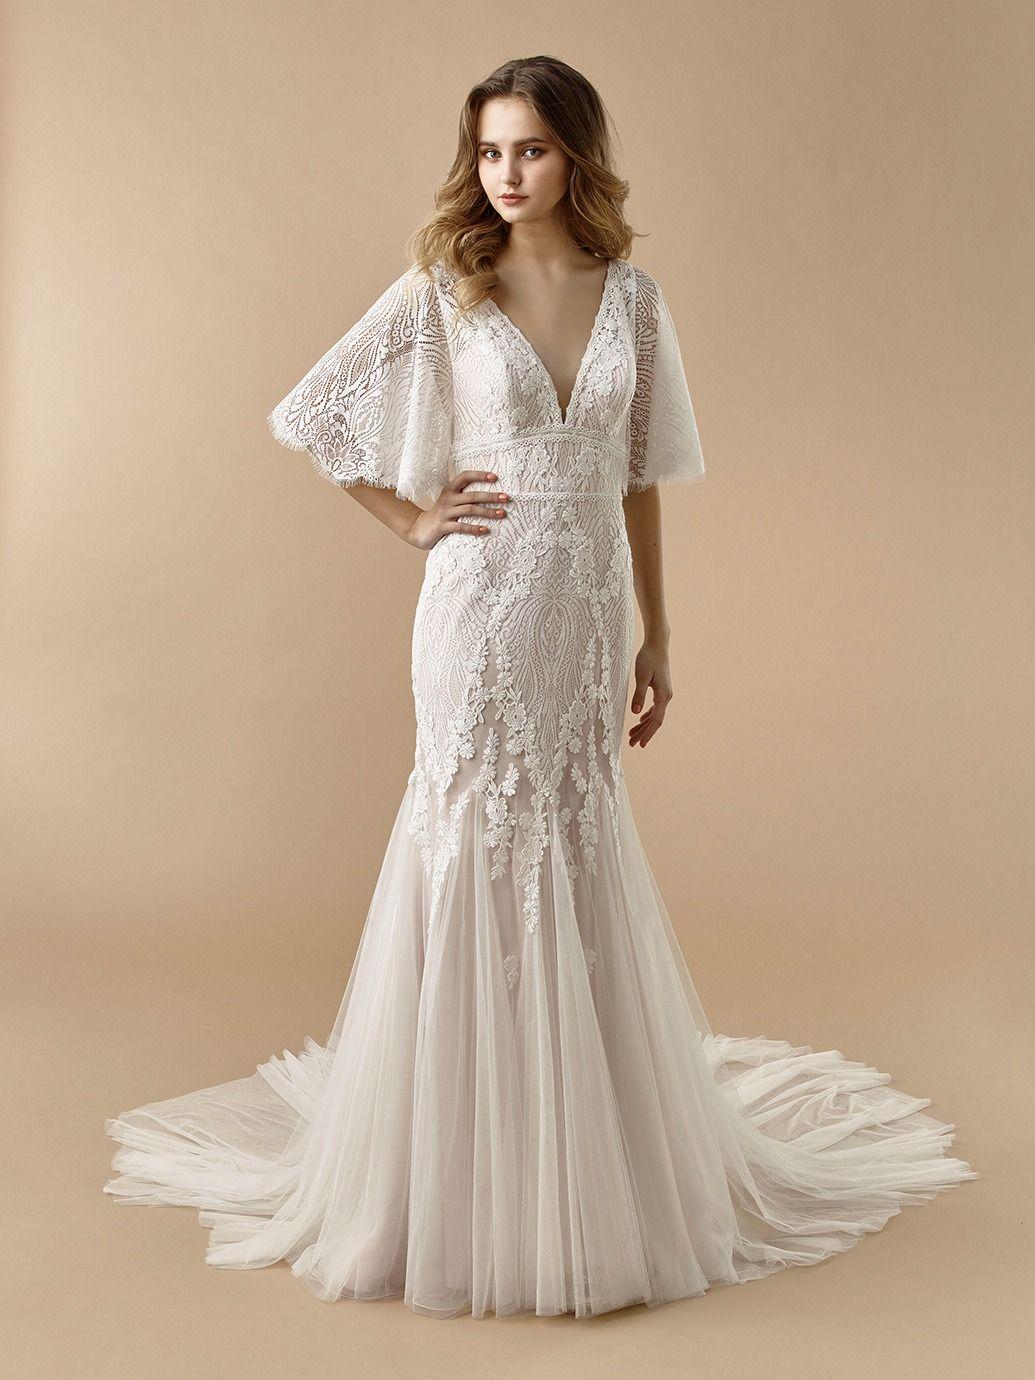 Bt20 05 Wedding Gown Short Sleeve Wedding Dress Wedding Dresses Short Wedding Dress [ 1380 x 1035 Pixel ]